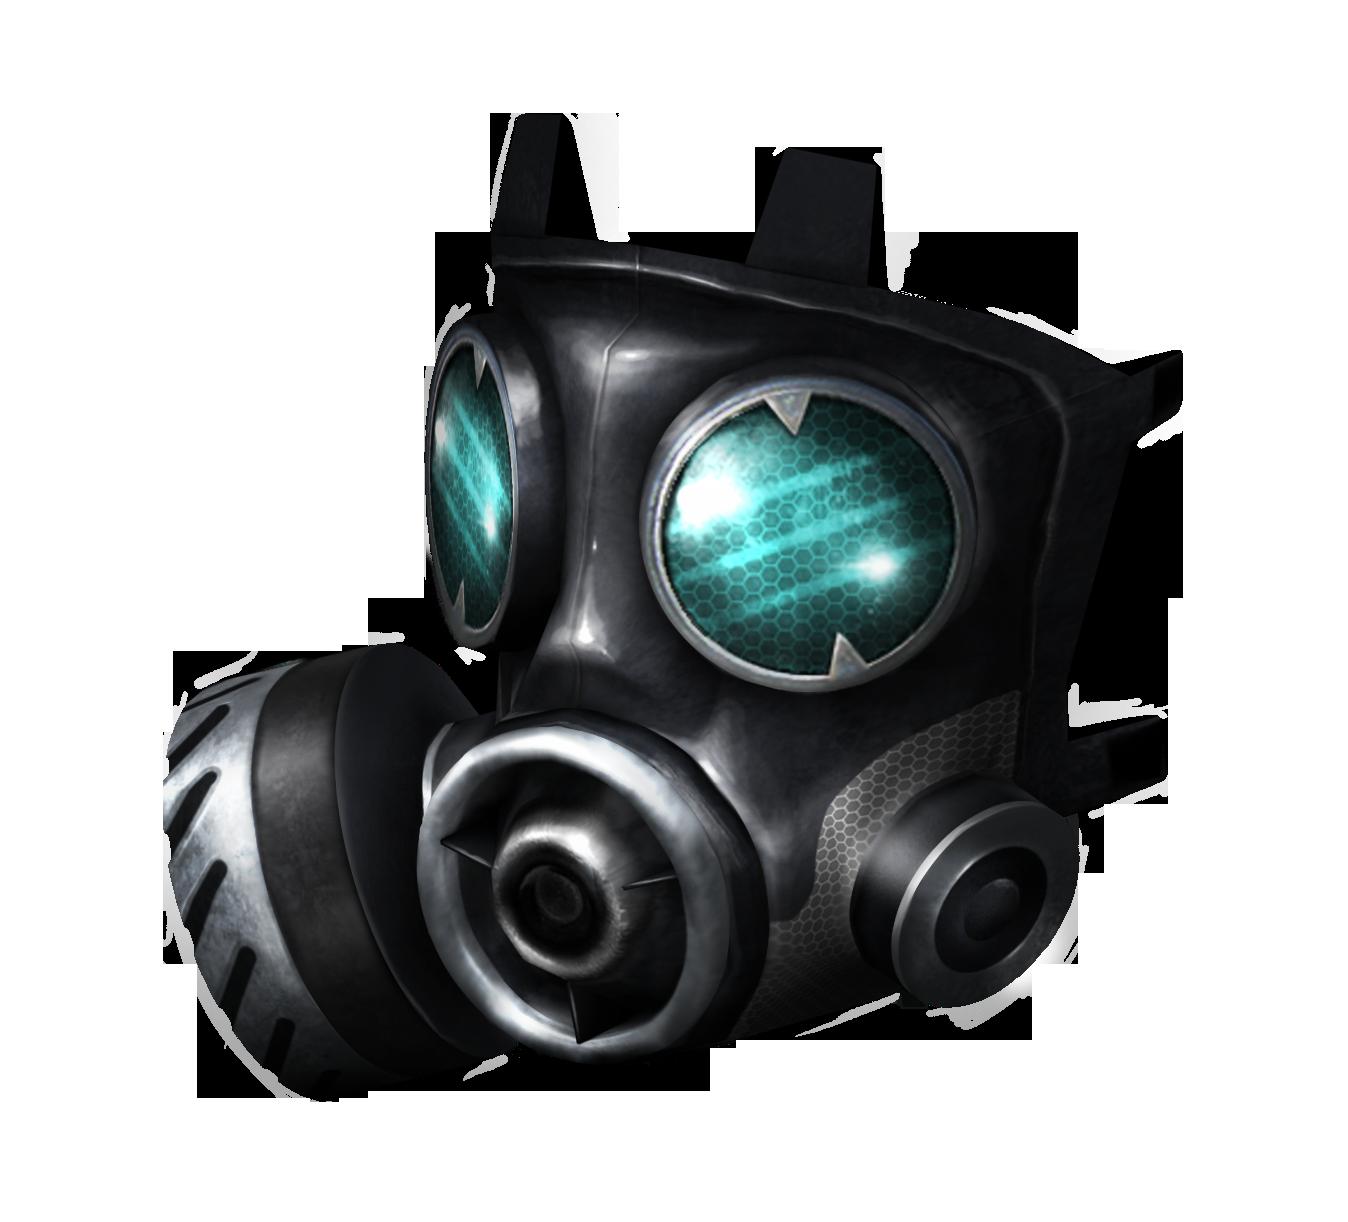 Gas Mask Png Image Gas Mask Gas Respirator Mask